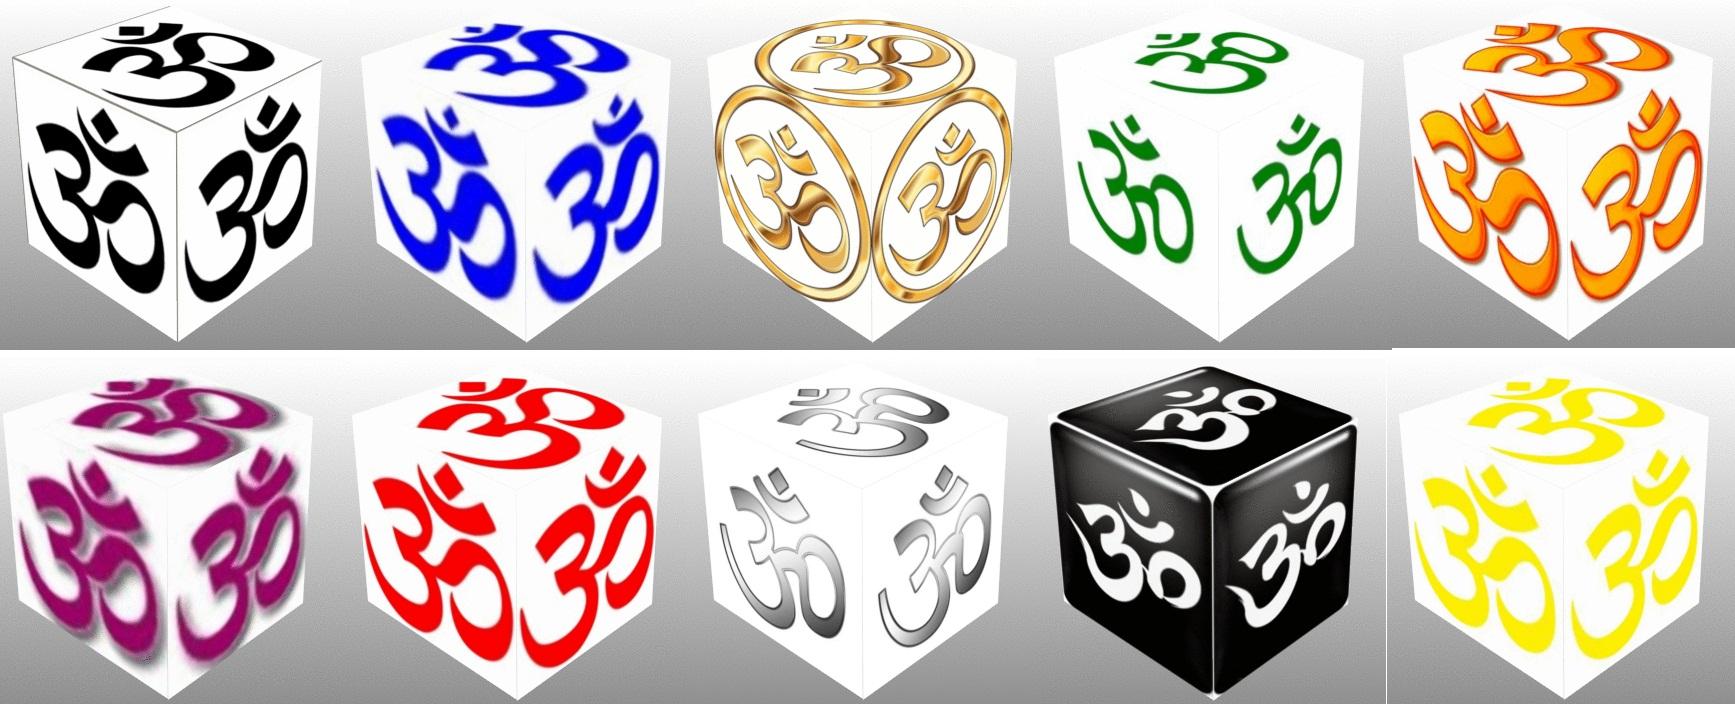 cube, 3d cube, Om symbol, black om, blue om, gold om, green om, orange om, purple om, red om, Pink Om, white om, yellow om, collage, good luck, Hindu